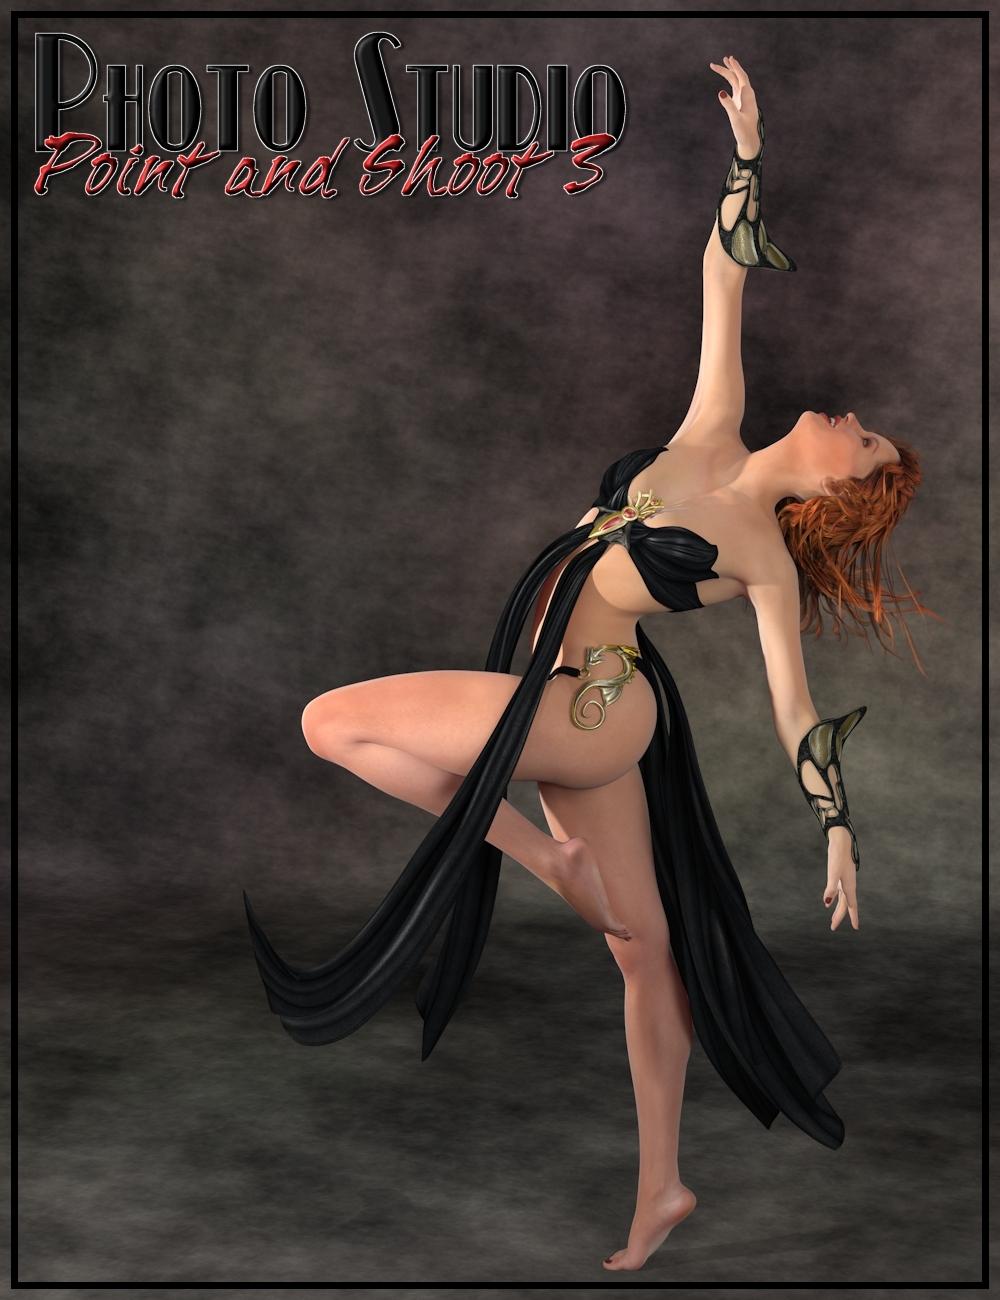 InaneGlory's Photo Studio - Point and Shoot 3 by: IDG DesignsDestinysGardenInaneGlory, 3D Models by Daz 3D